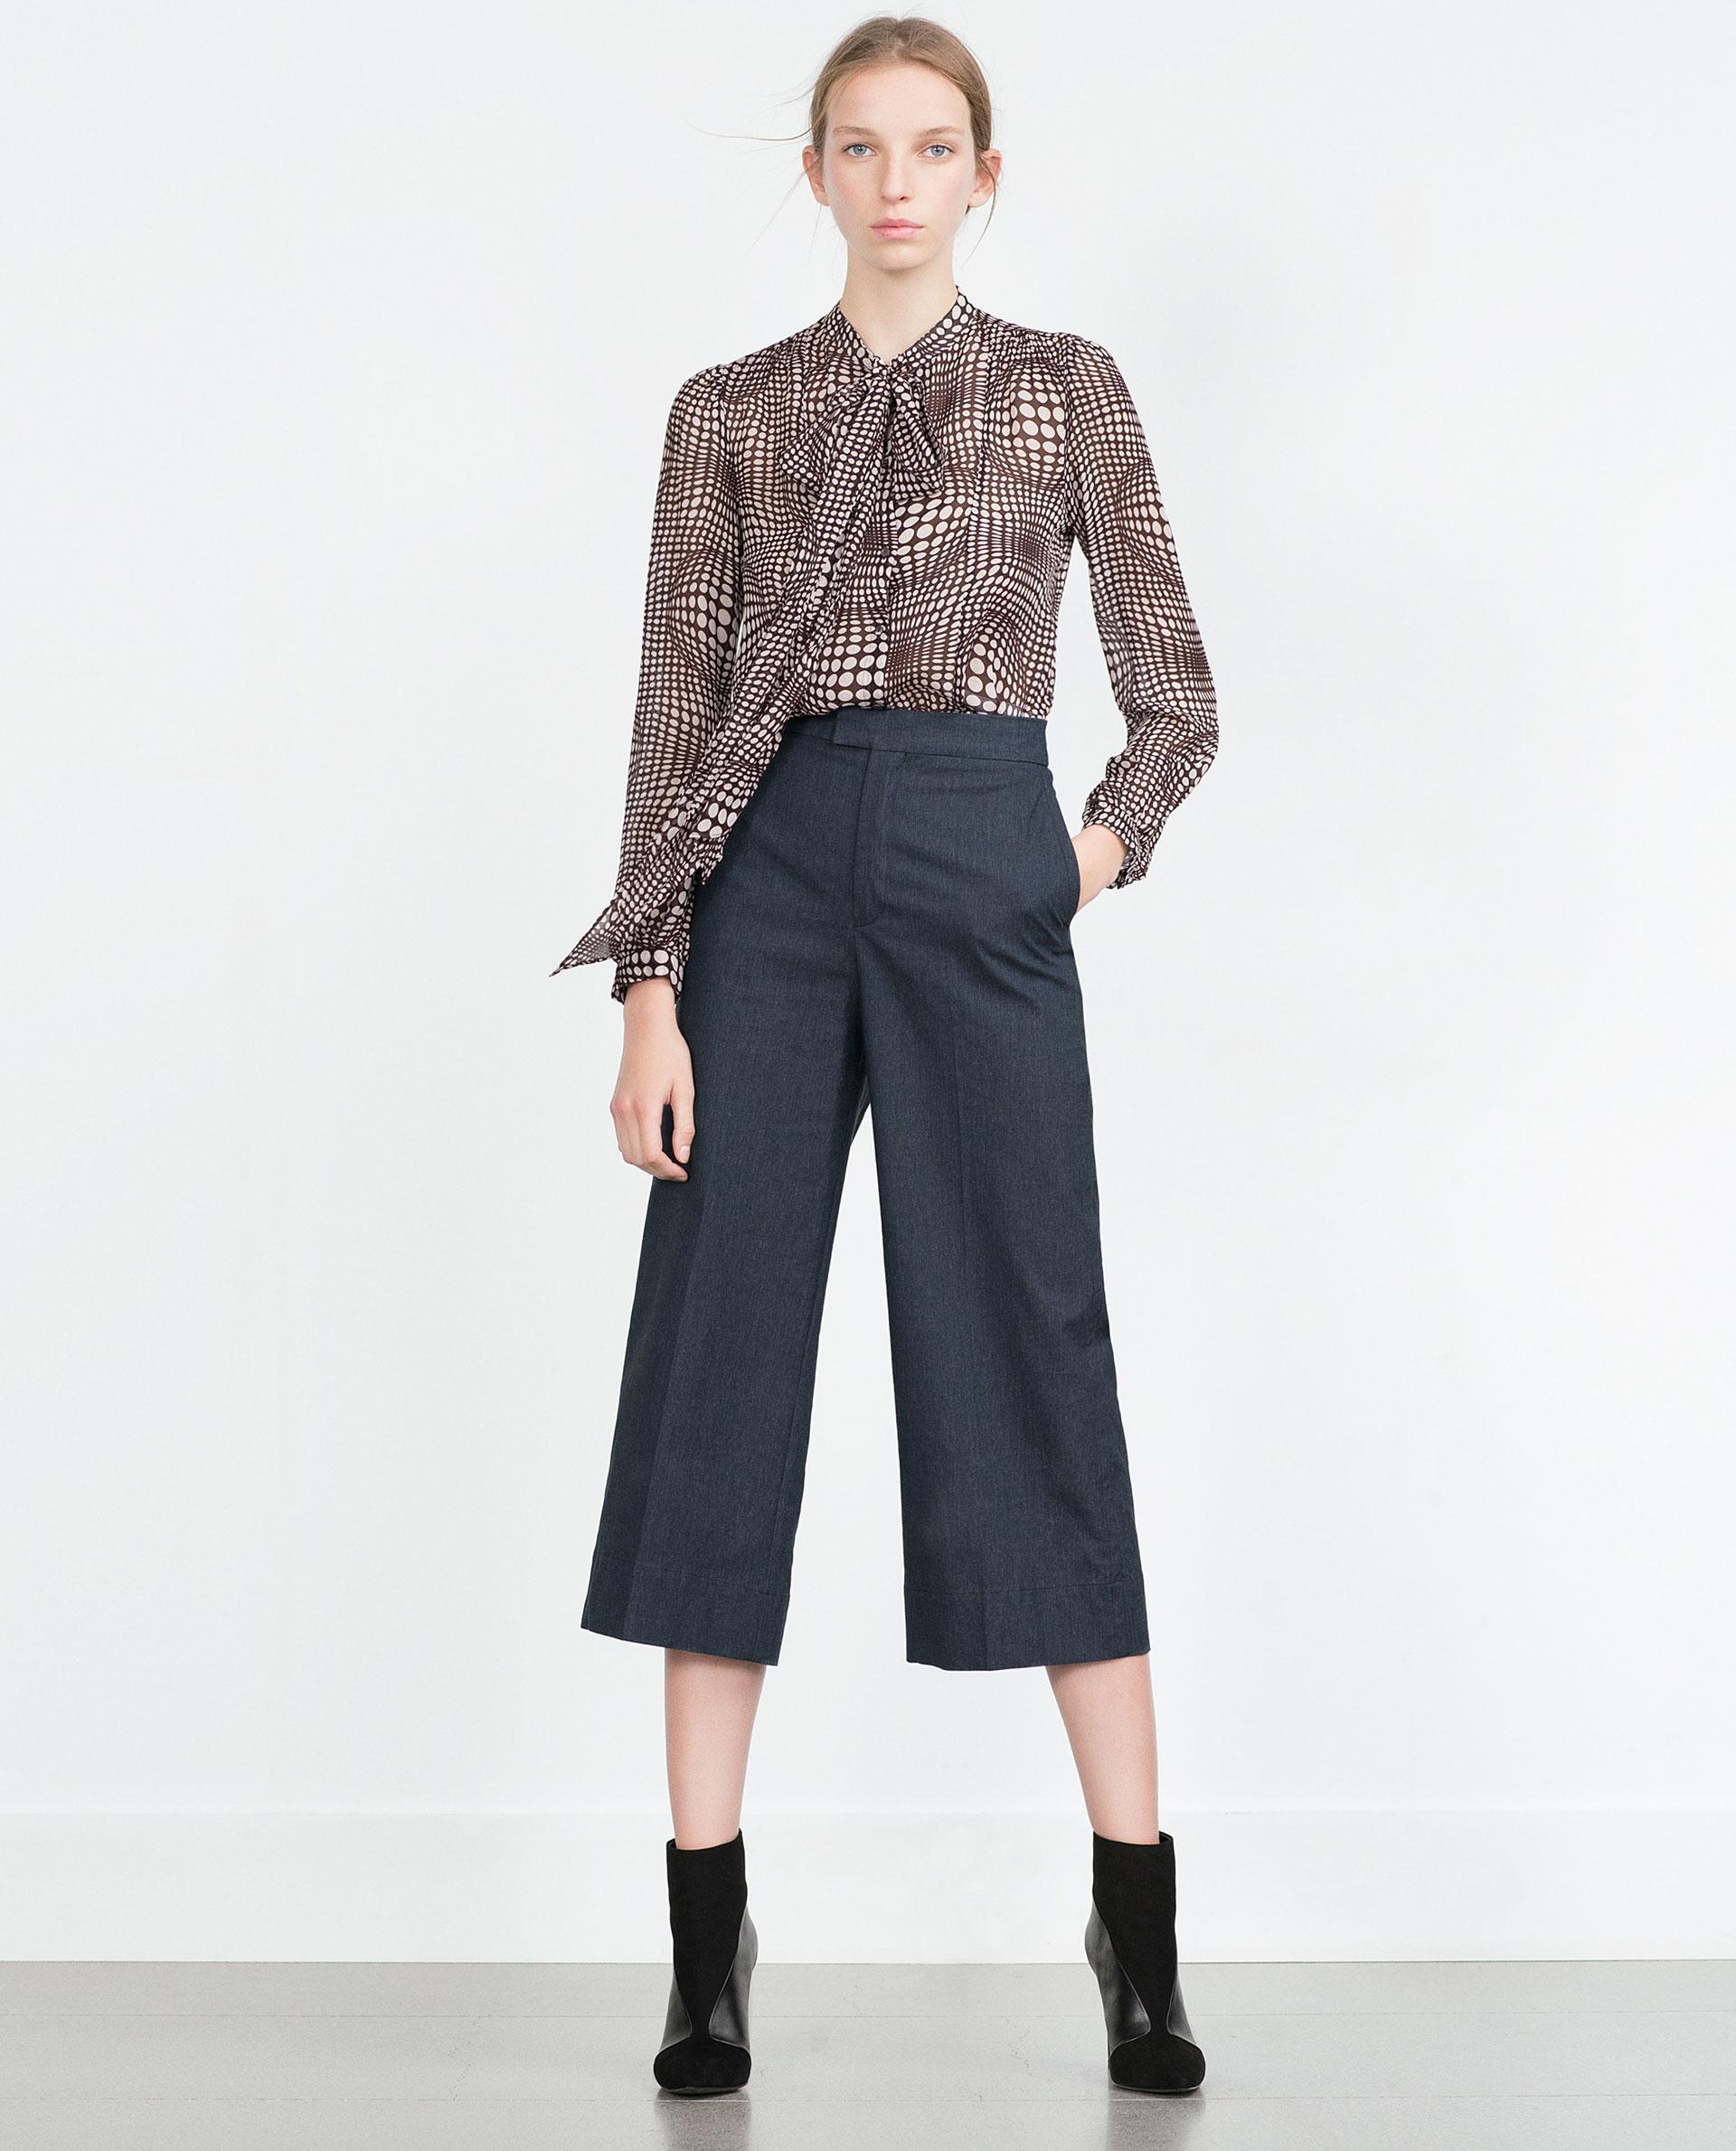 Zara Womens Blouses 93